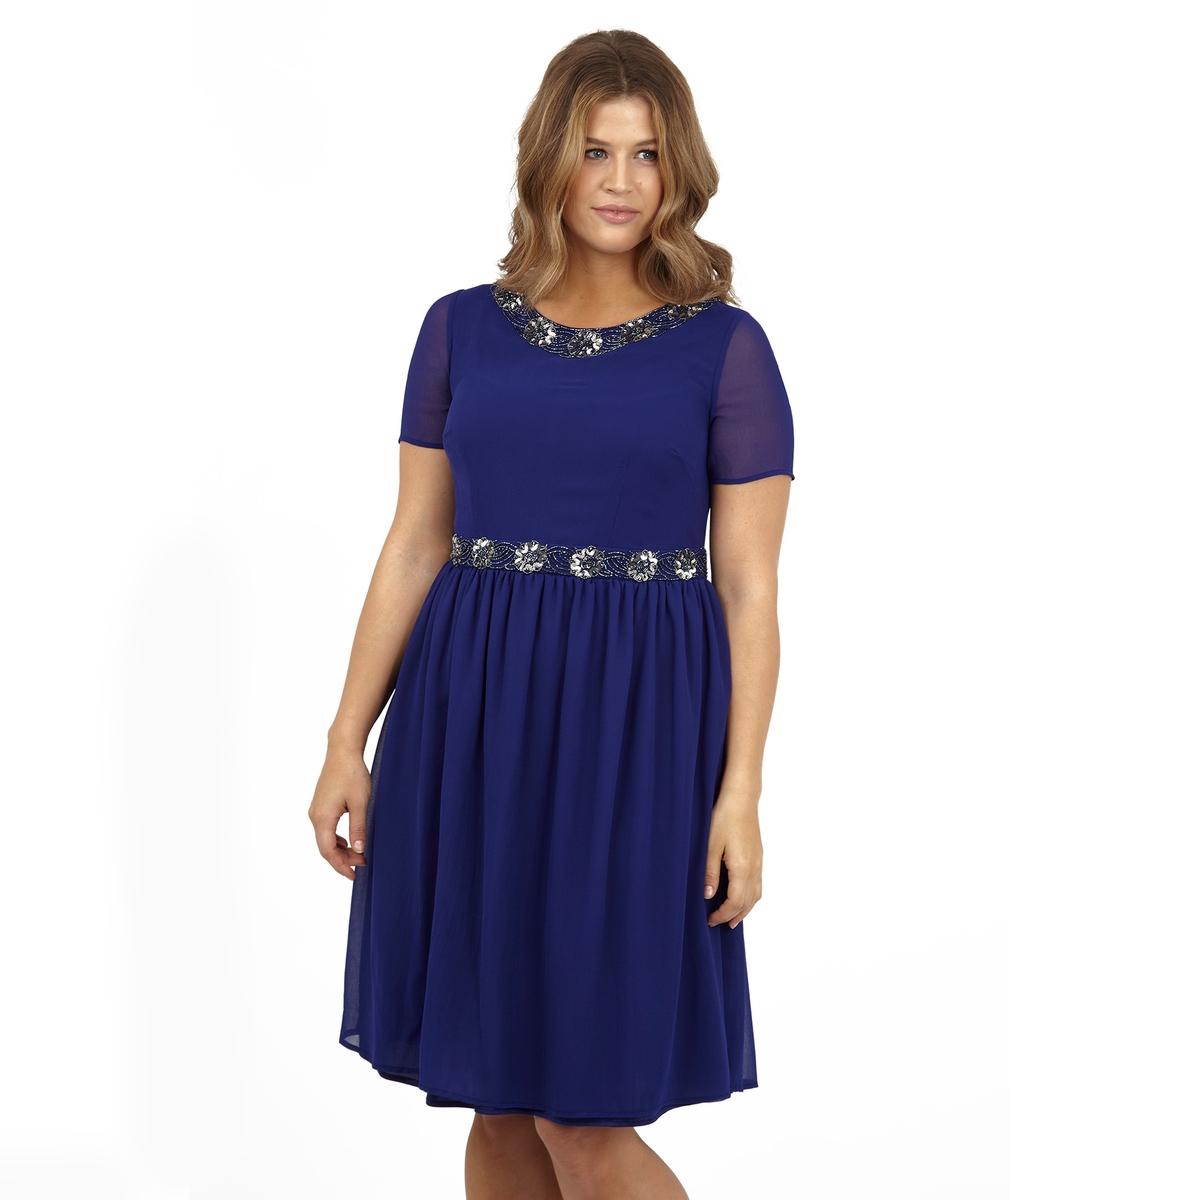 ПлатьеПлатье с короткими рукавами KOKO BY KOKO. 100% полиэстер.<br><br>Цвет: синий<br>Размер: 54/56 (FR) - 60/62 (RUS)